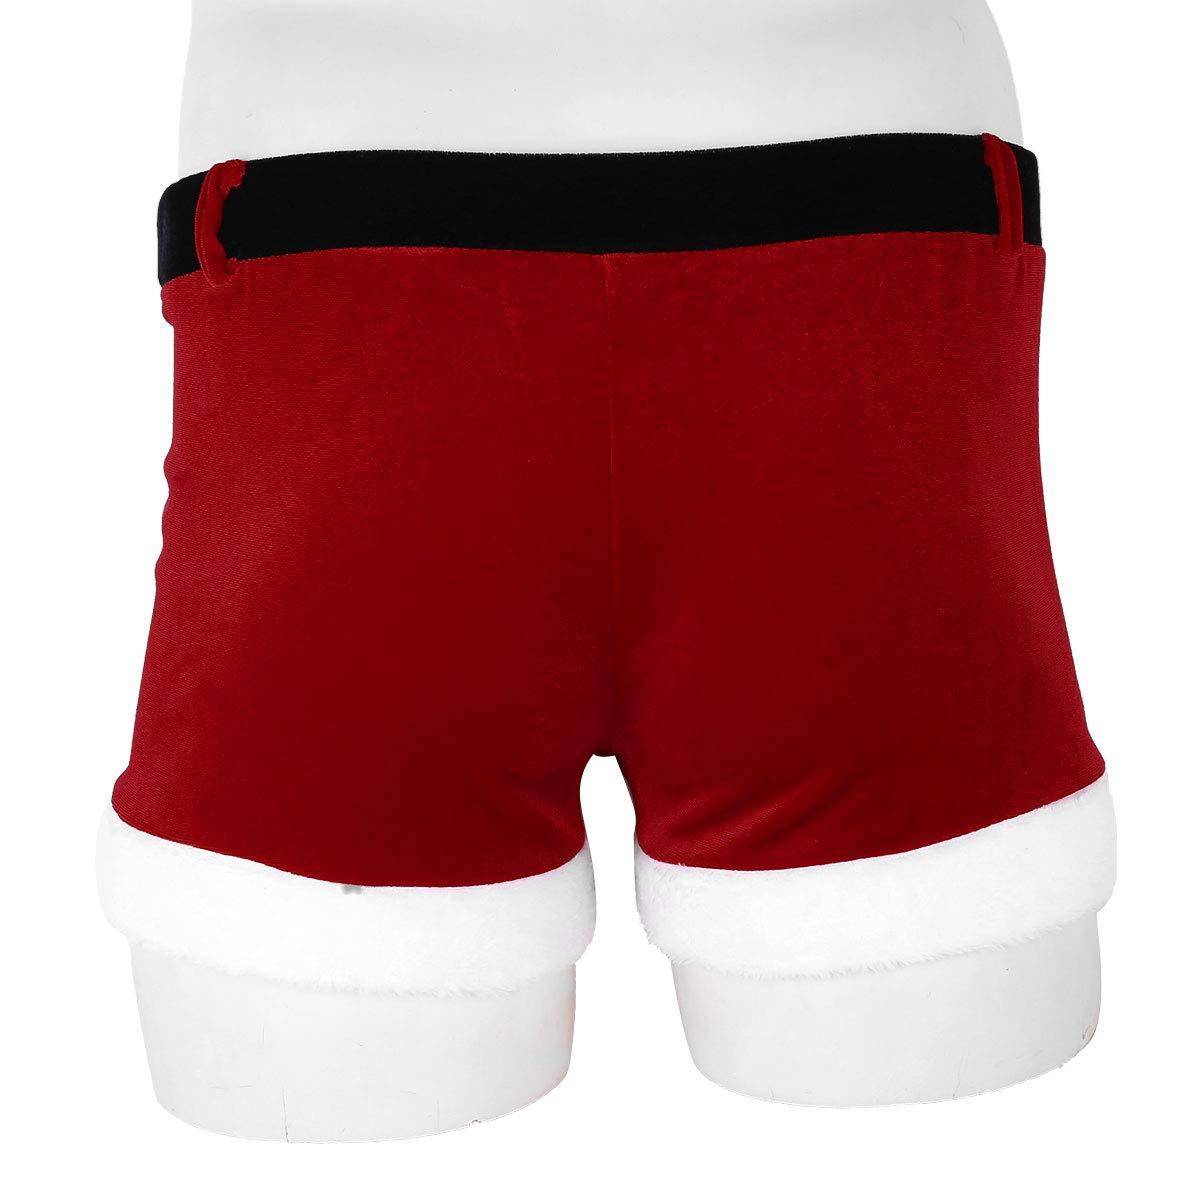 iEFiEL Christmas Holiday Mens Boxer Shorts Velvet Christmas Santa Claus Boxers Trunks Underwear